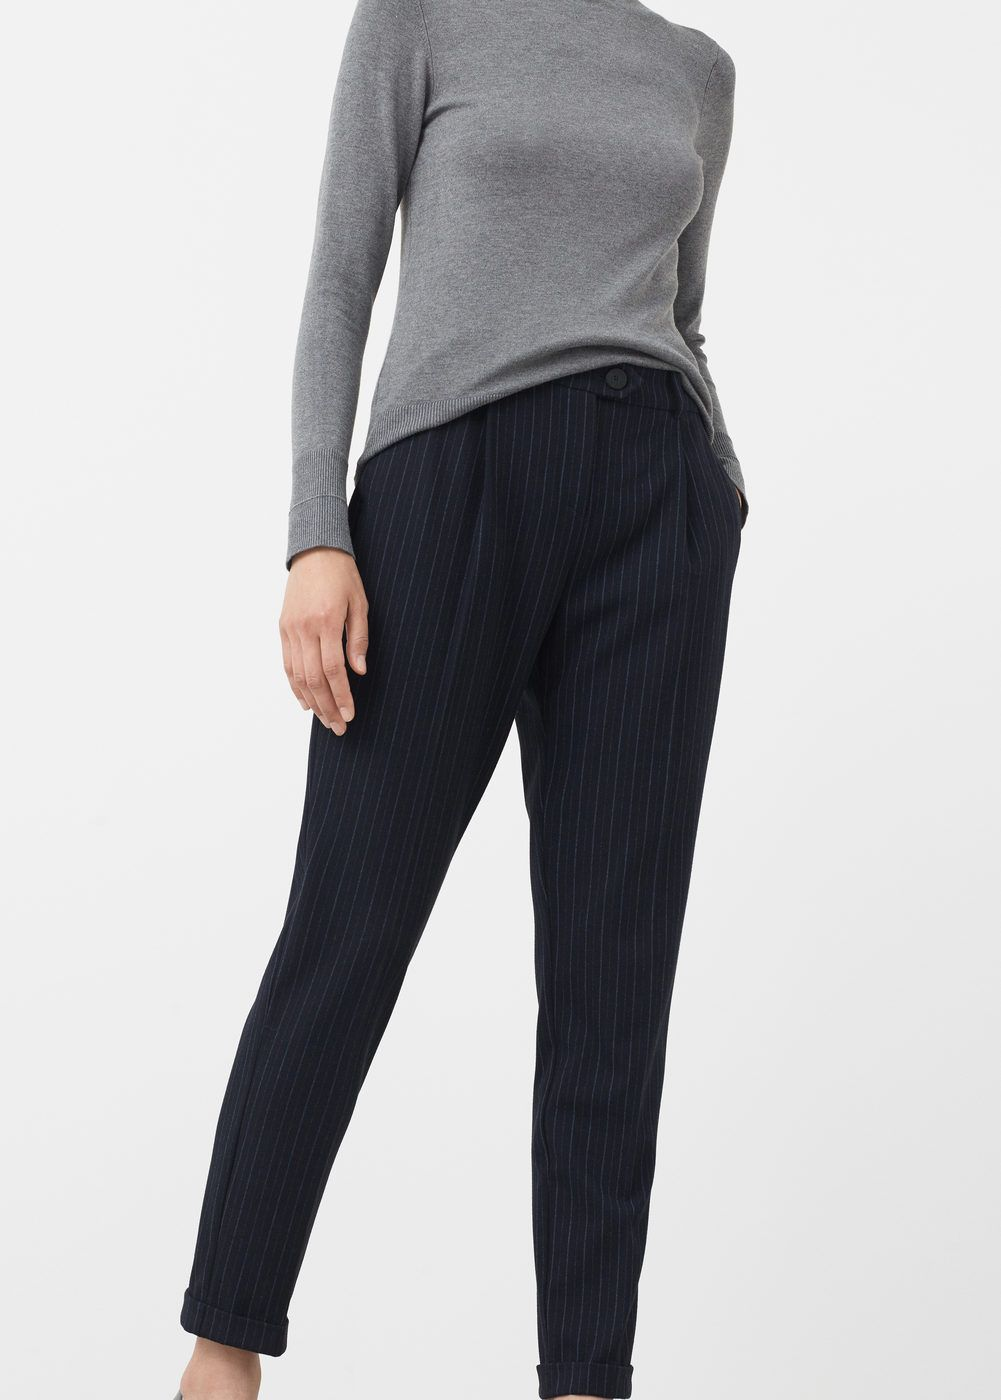 pantalon rayures femme rayures pantalons et tenues. Black Bedroom Furniture Sets. Home Design Ideas